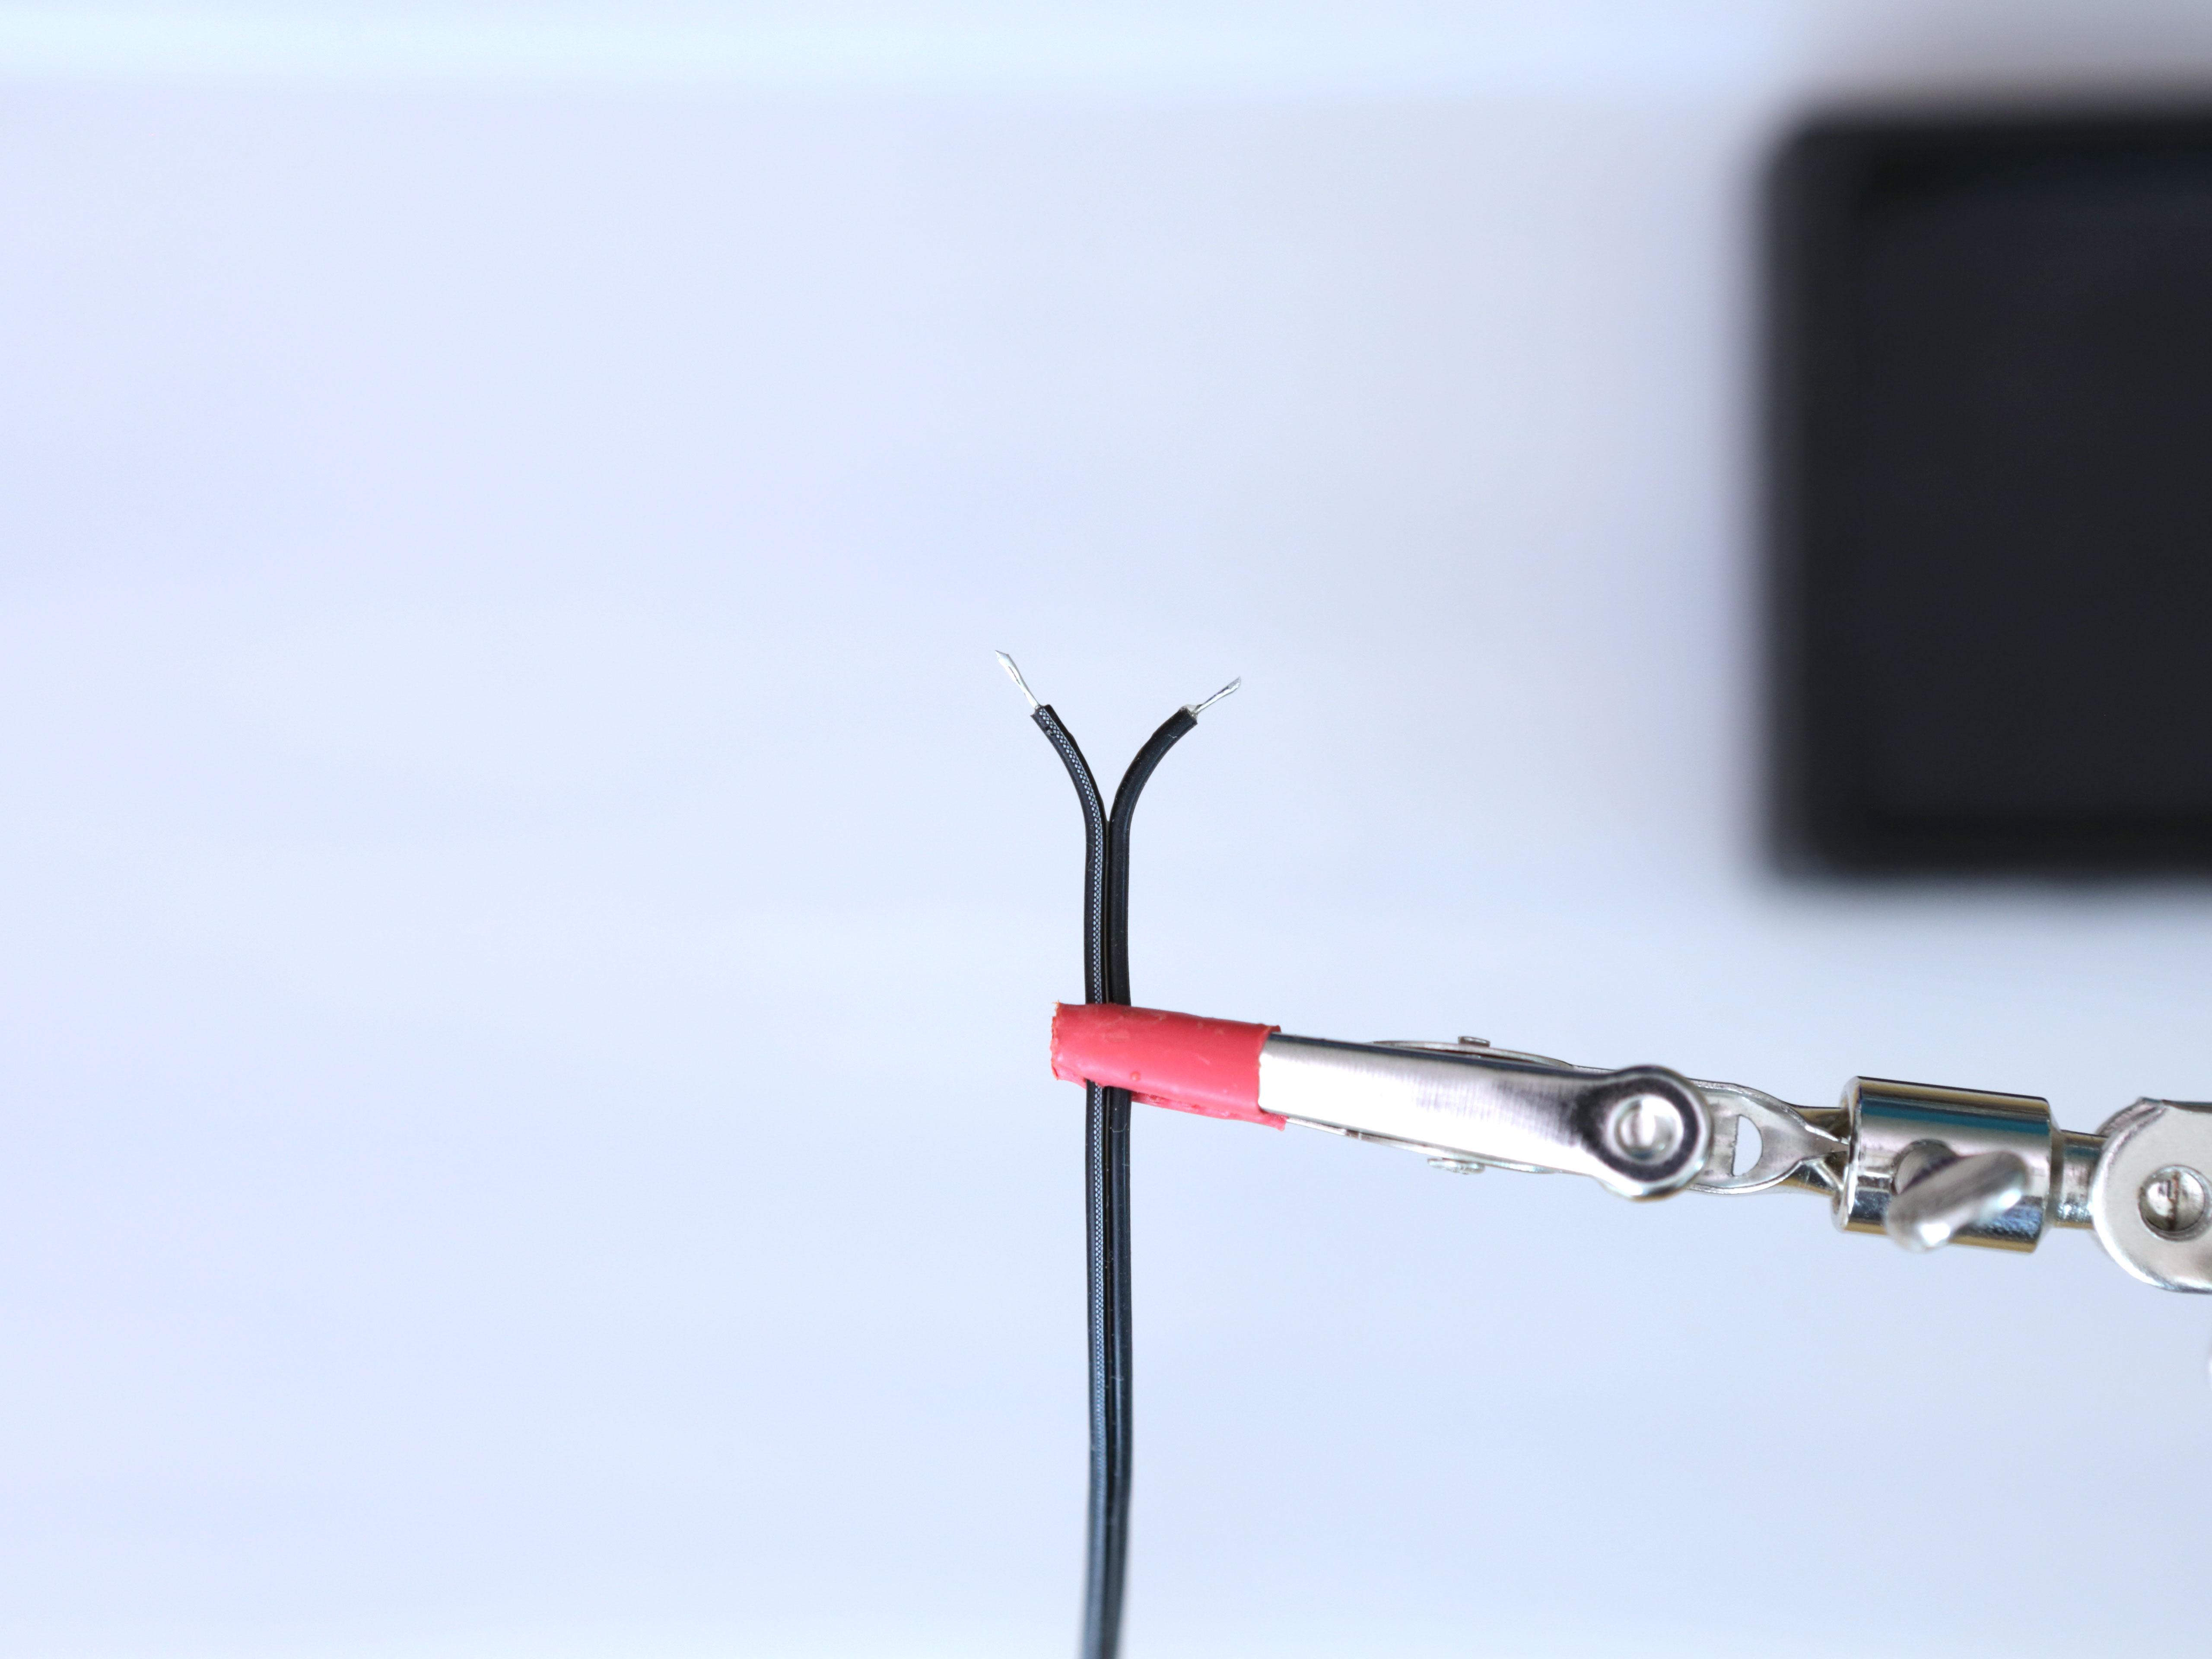 3d_printing_wire-tinning.jpg